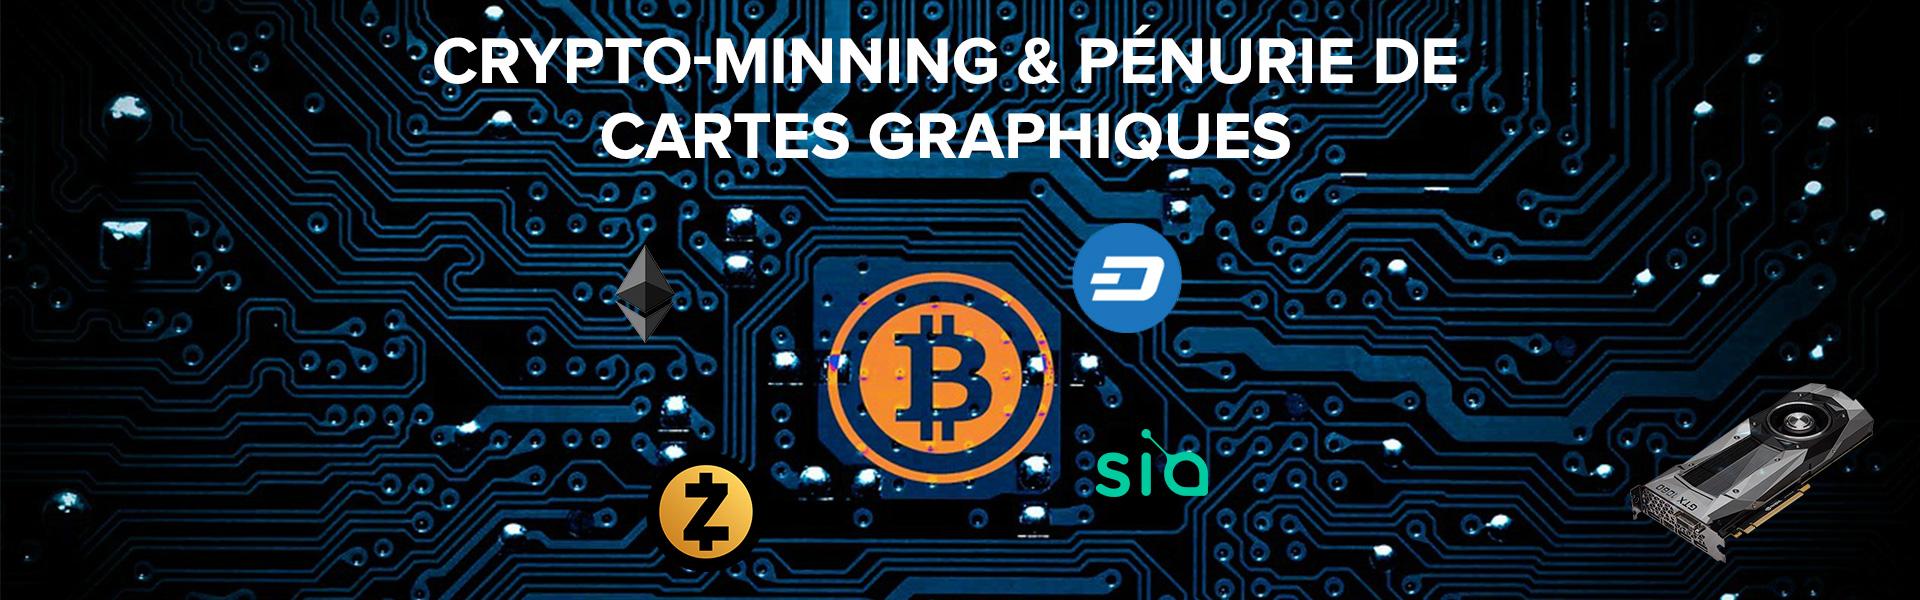 banniere-actualite-cryptomonnaie-trade-discount